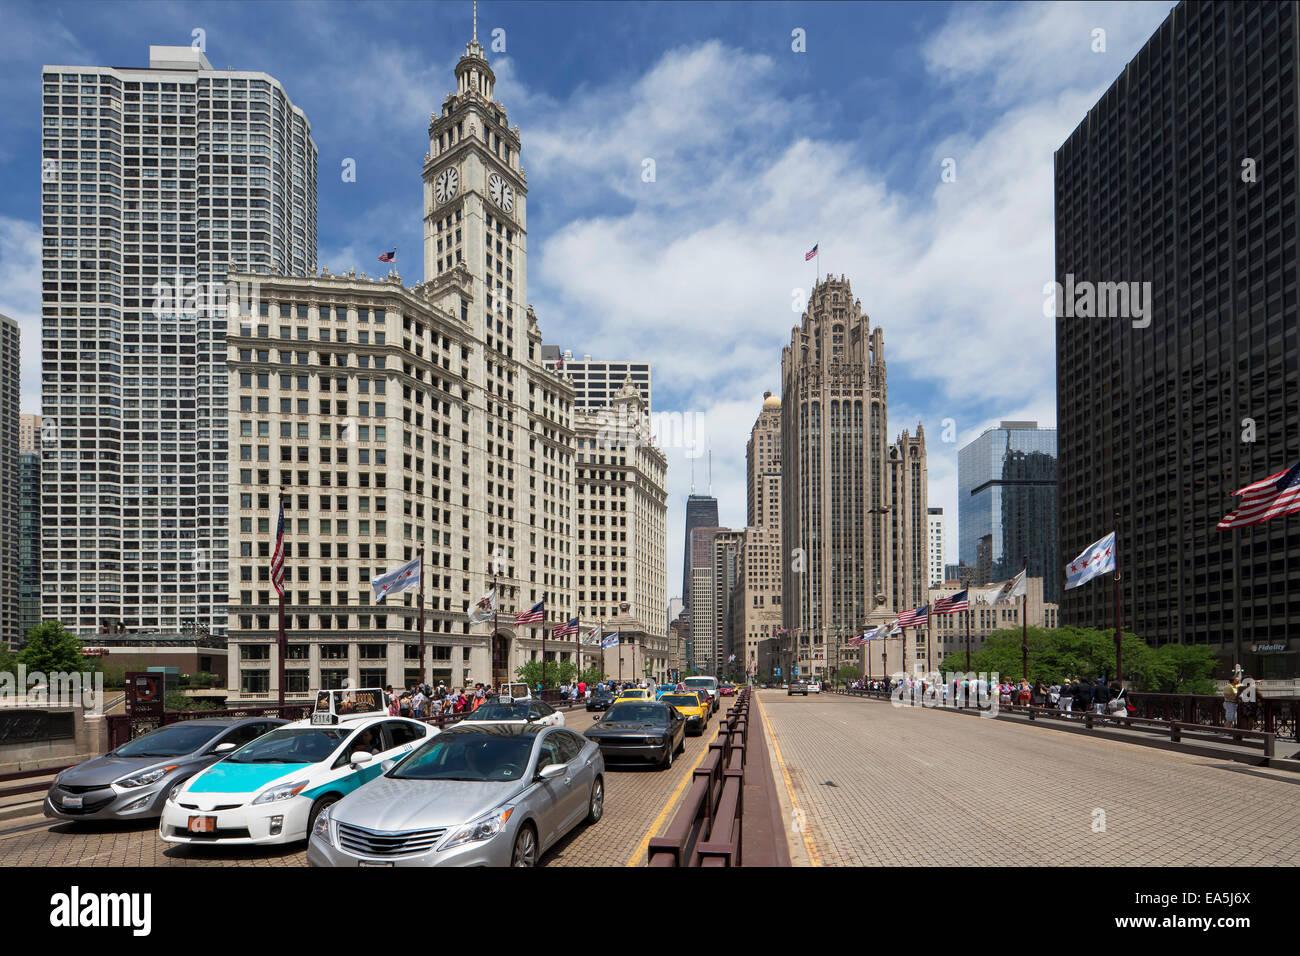 USA, Illinois, Chicago, Wrigley Building and Tribune Tower - Stock Image